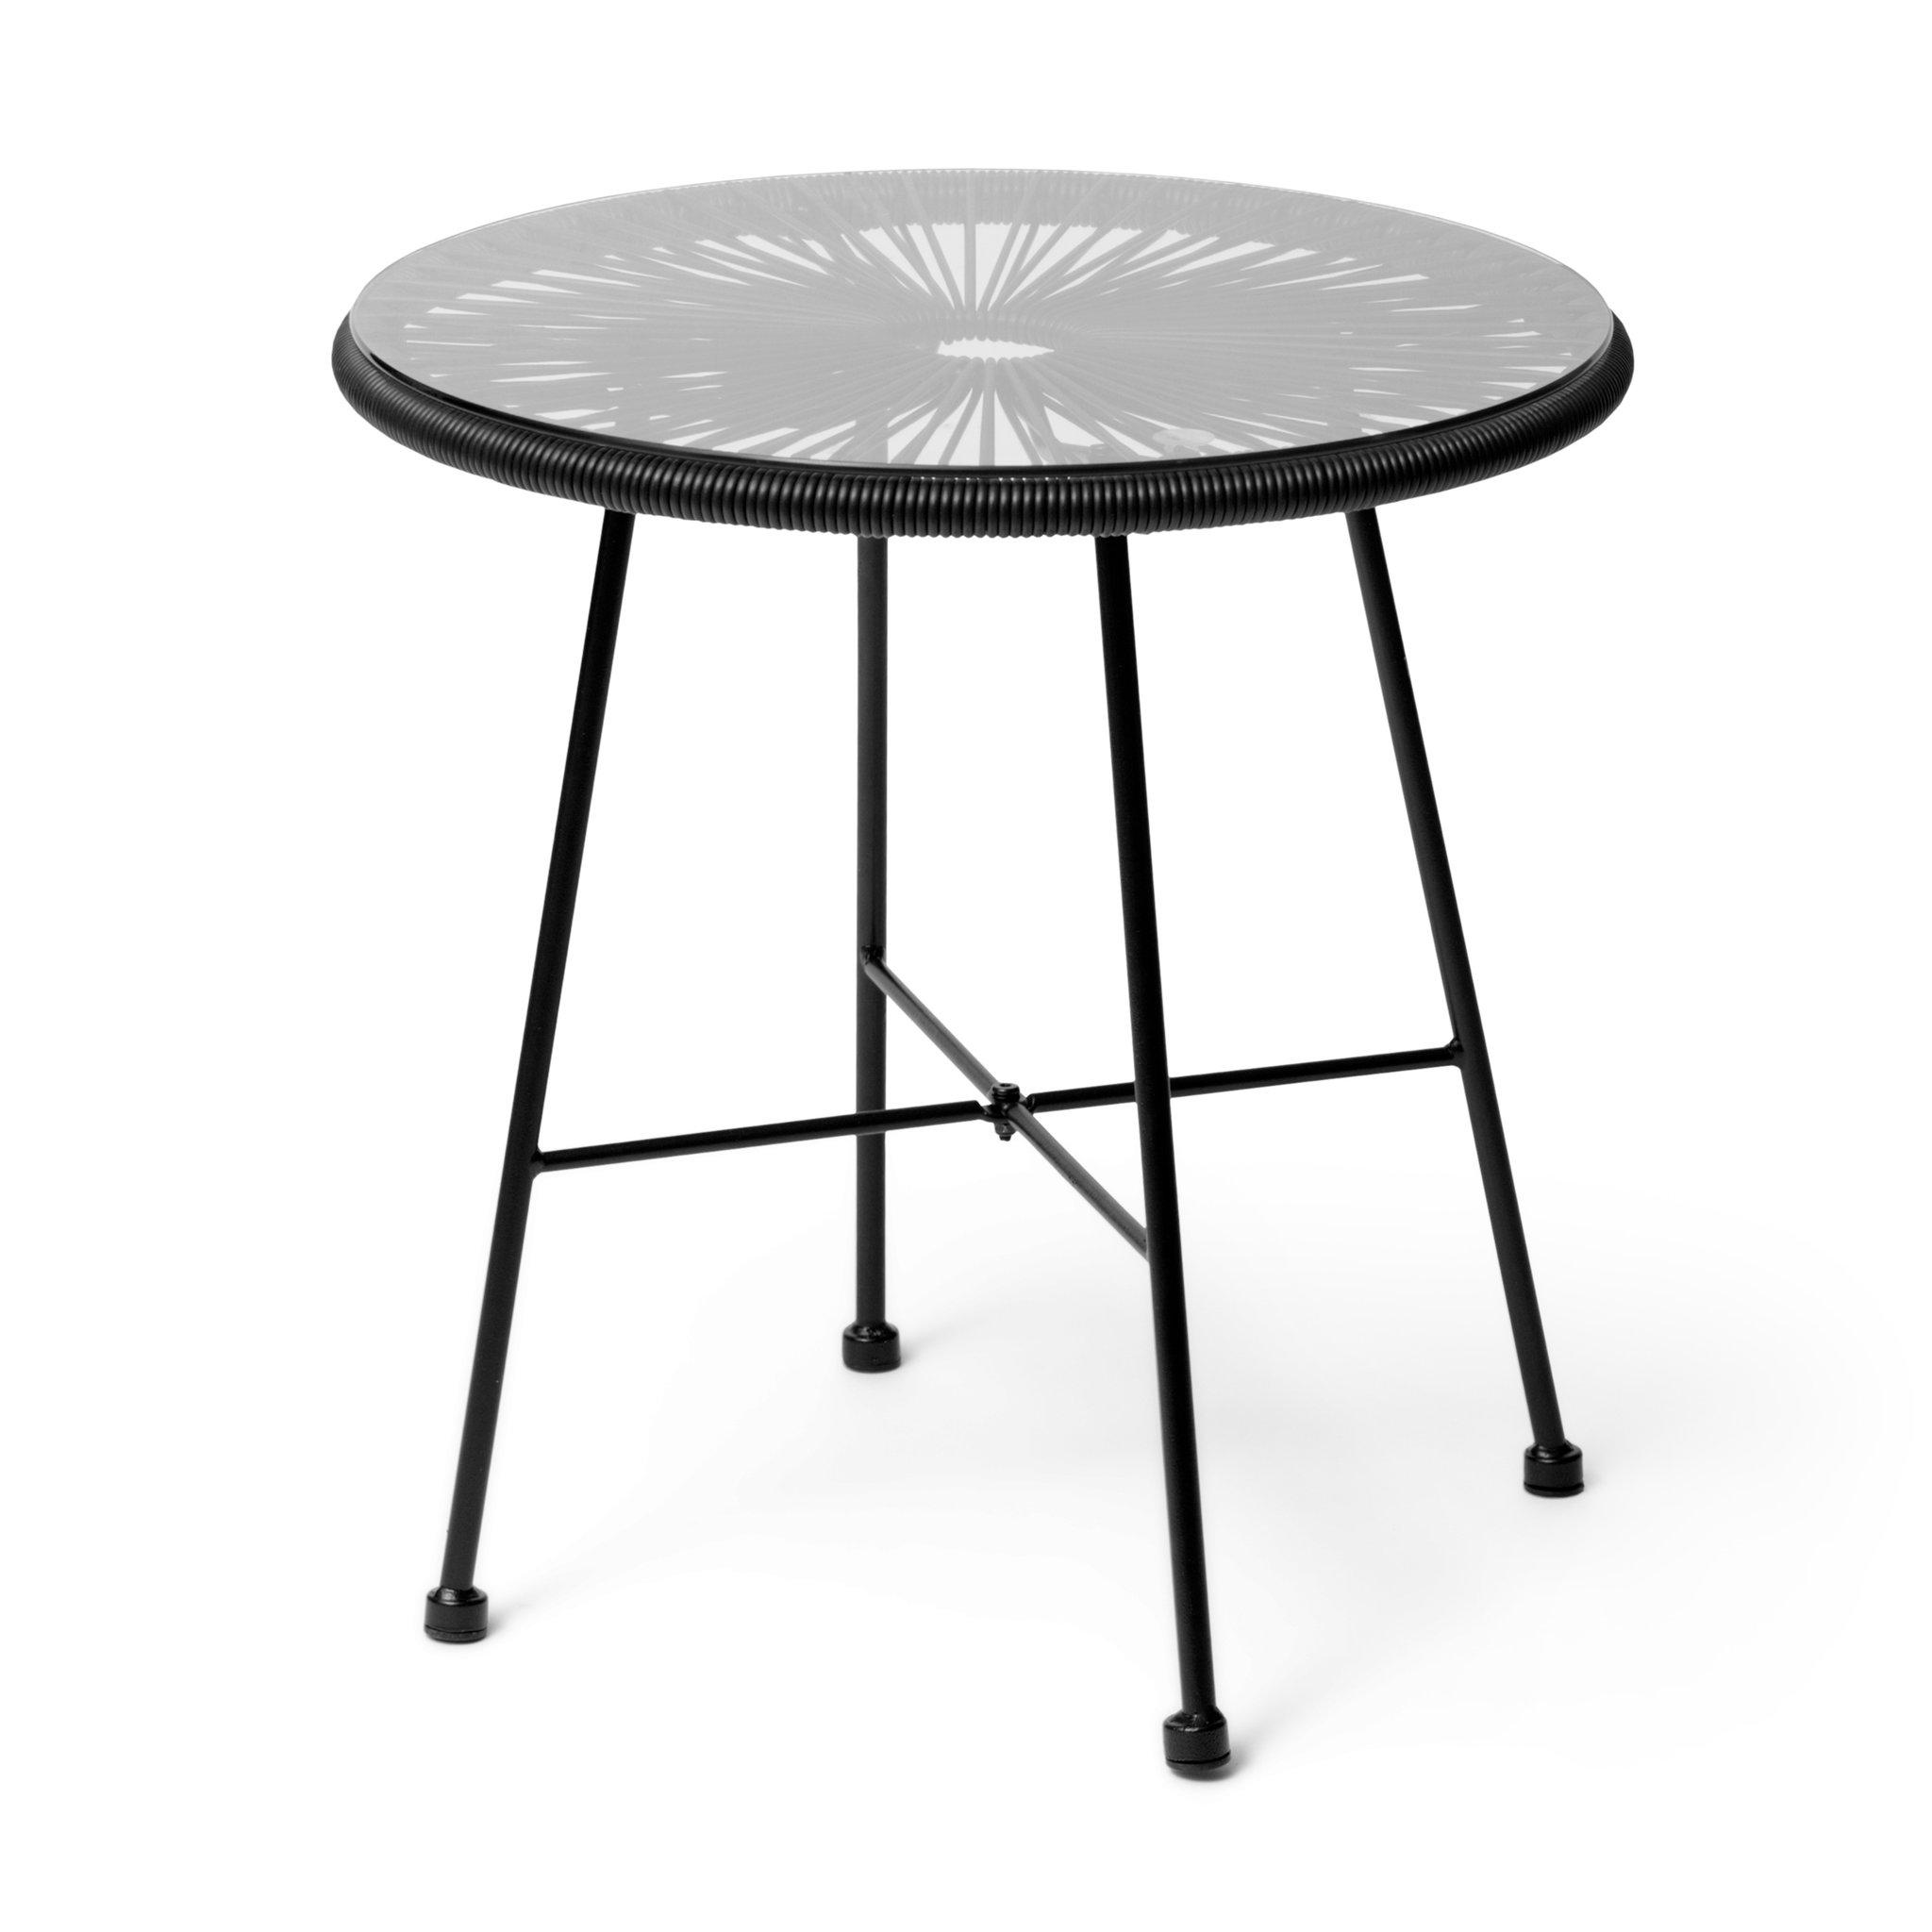 Cafébord VIRA 52x51 cm